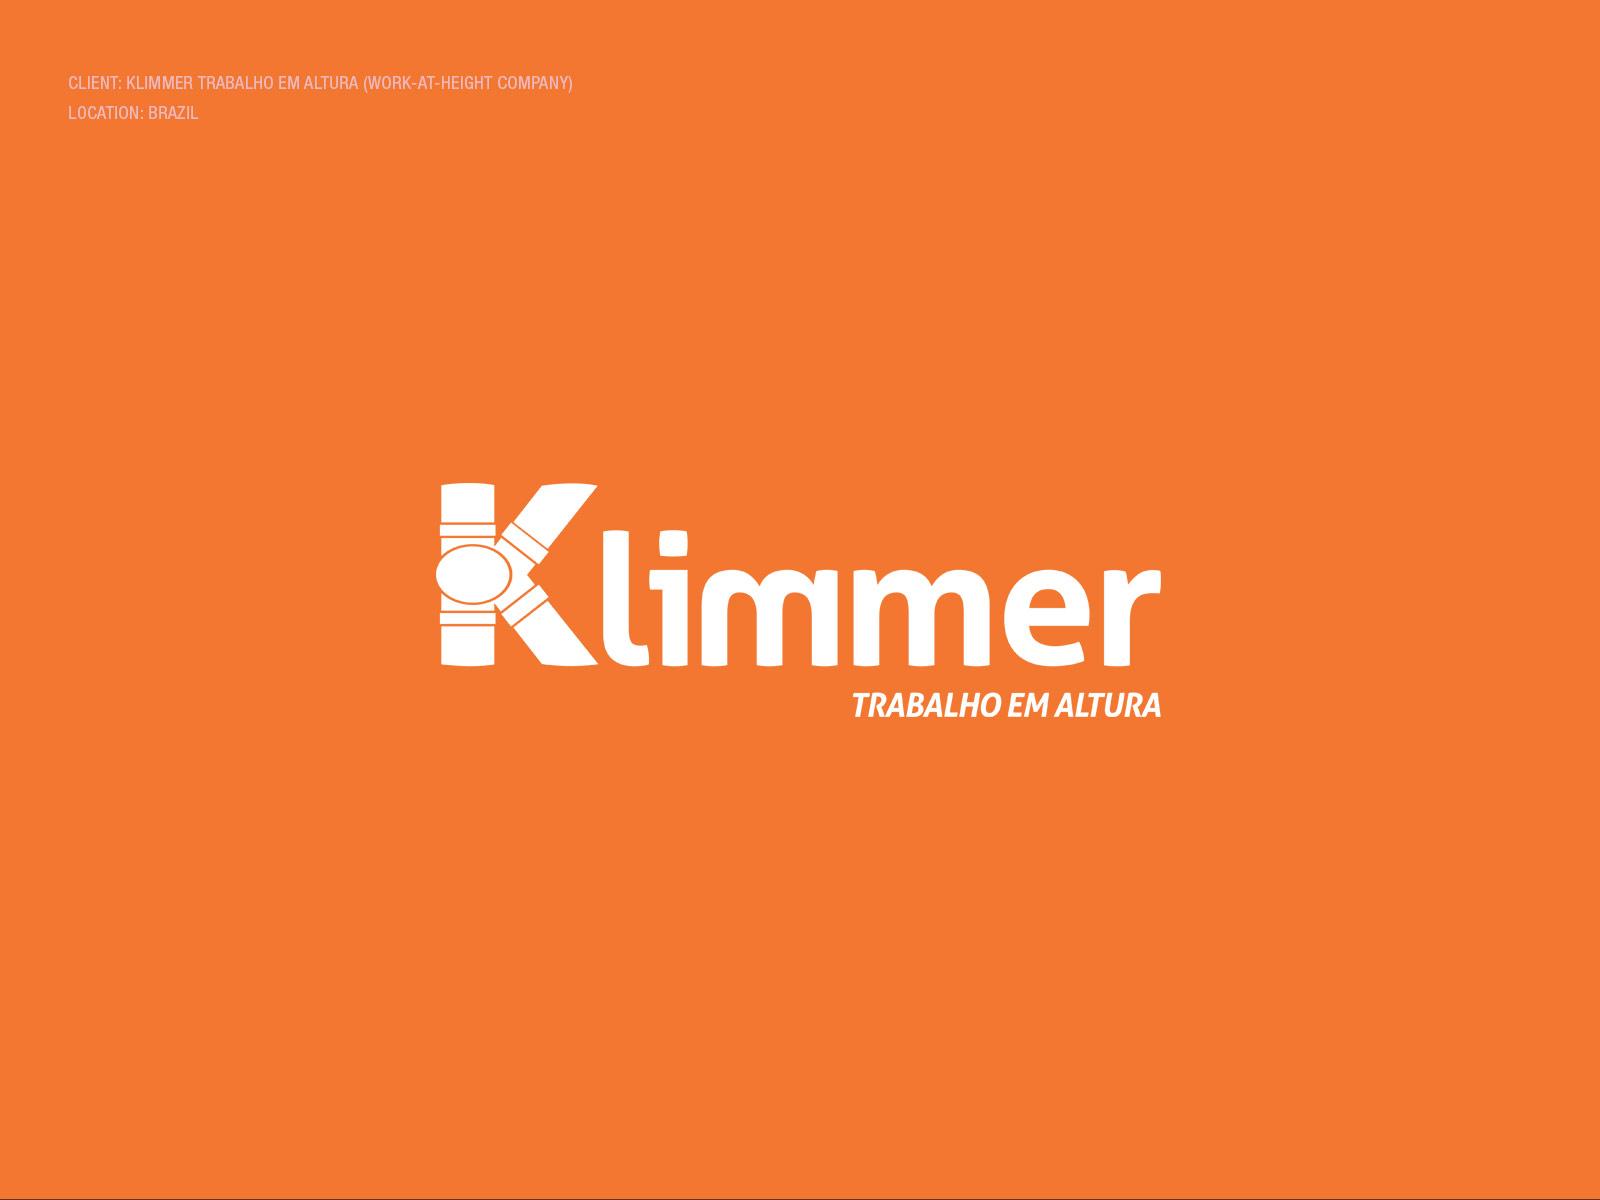 logodesign-klimmer